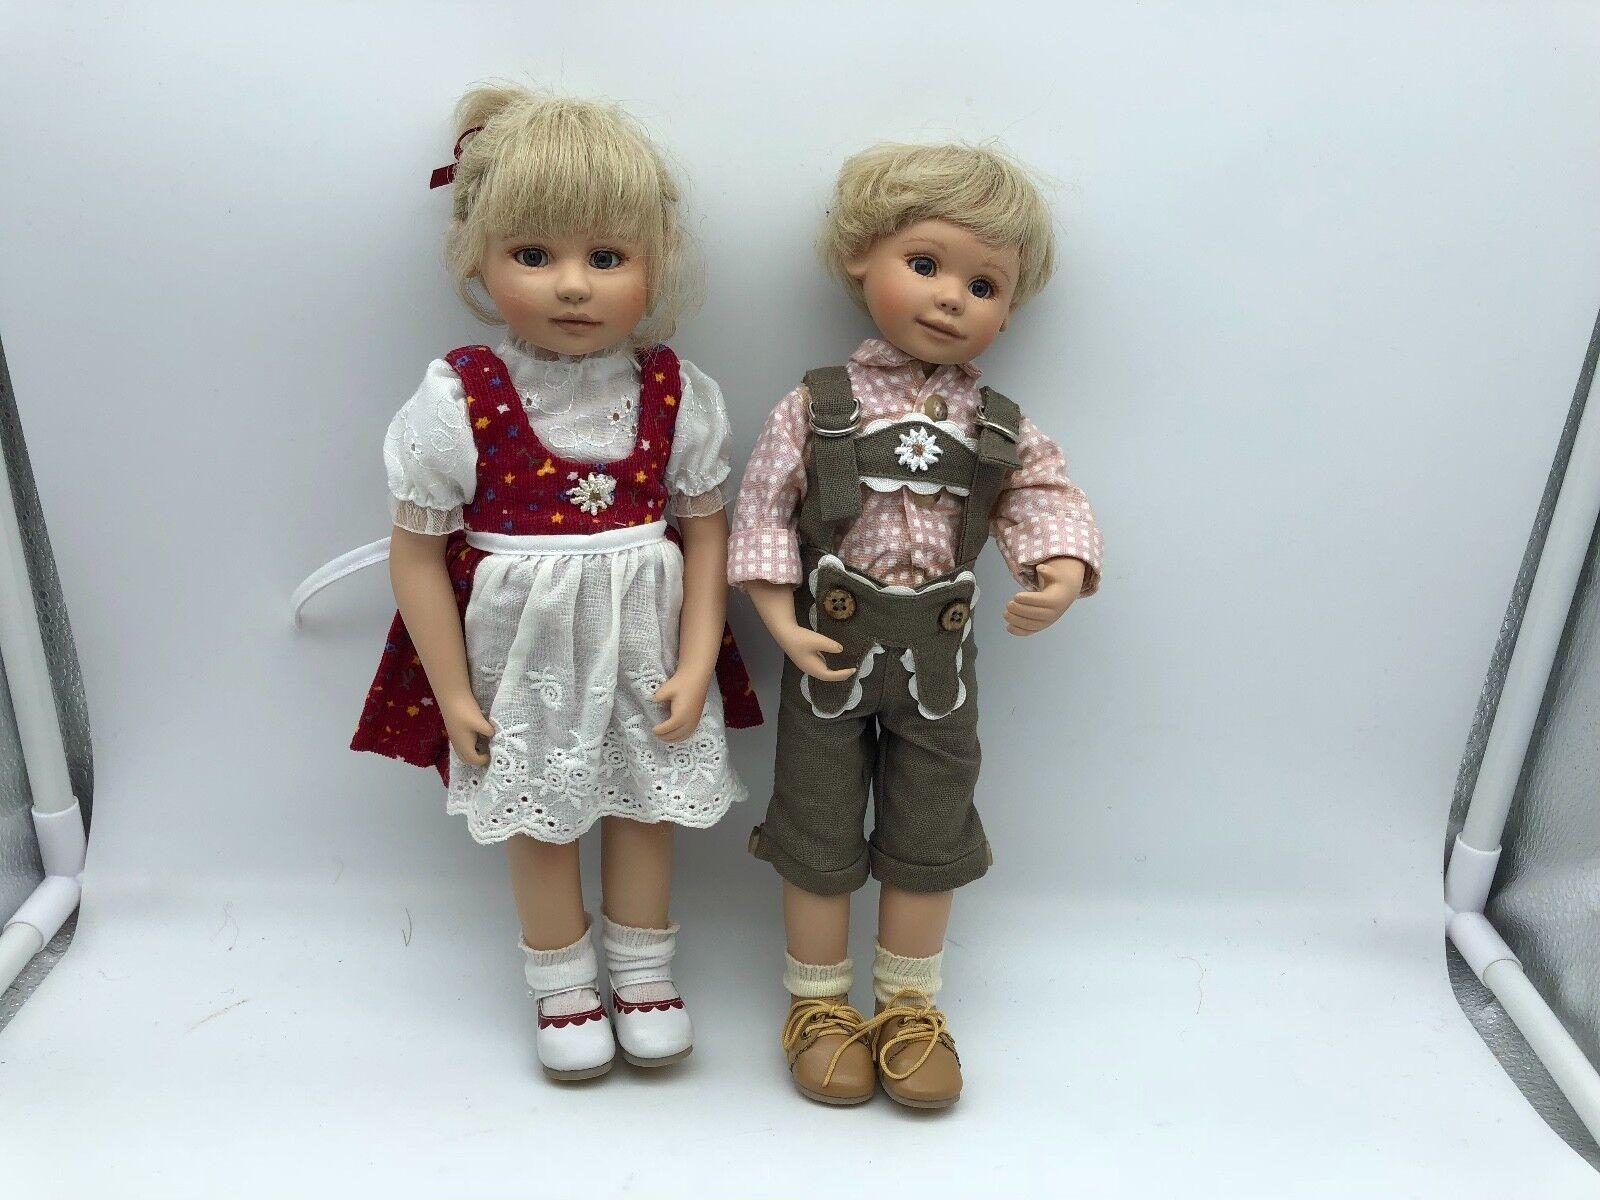 Gabriele Müller ⭐ ⭐ PORCELLANA bambole Marlene & Max 30 cm. ⭐ ⭐ ottimo stato